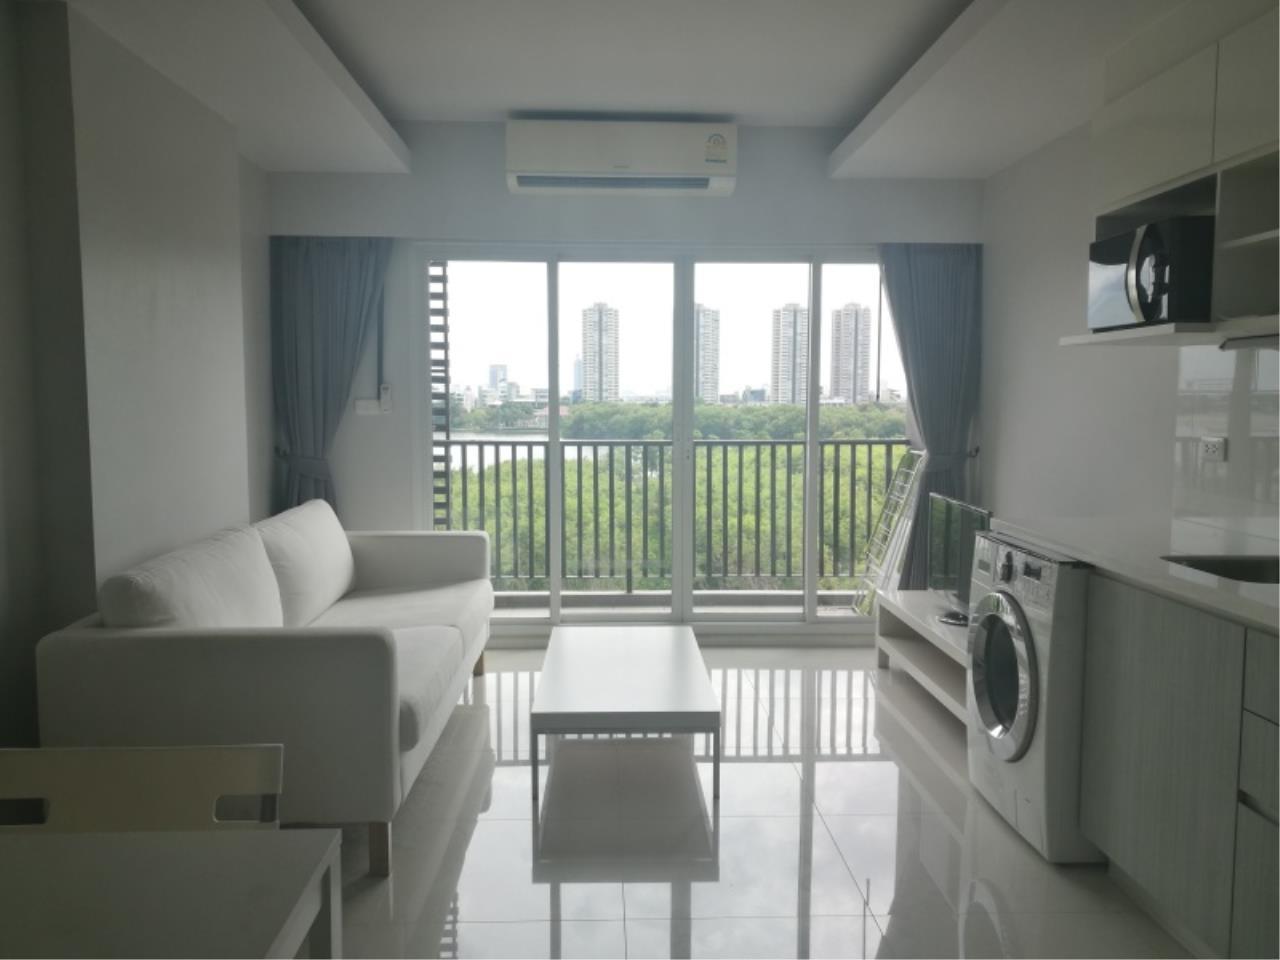 Century21 Skylux Agency's Double Lake Muang Thong Thani / Condo For Rent / 2 Bedroom / 57 SQM / Mueng Thong Thani / Bangkok 2